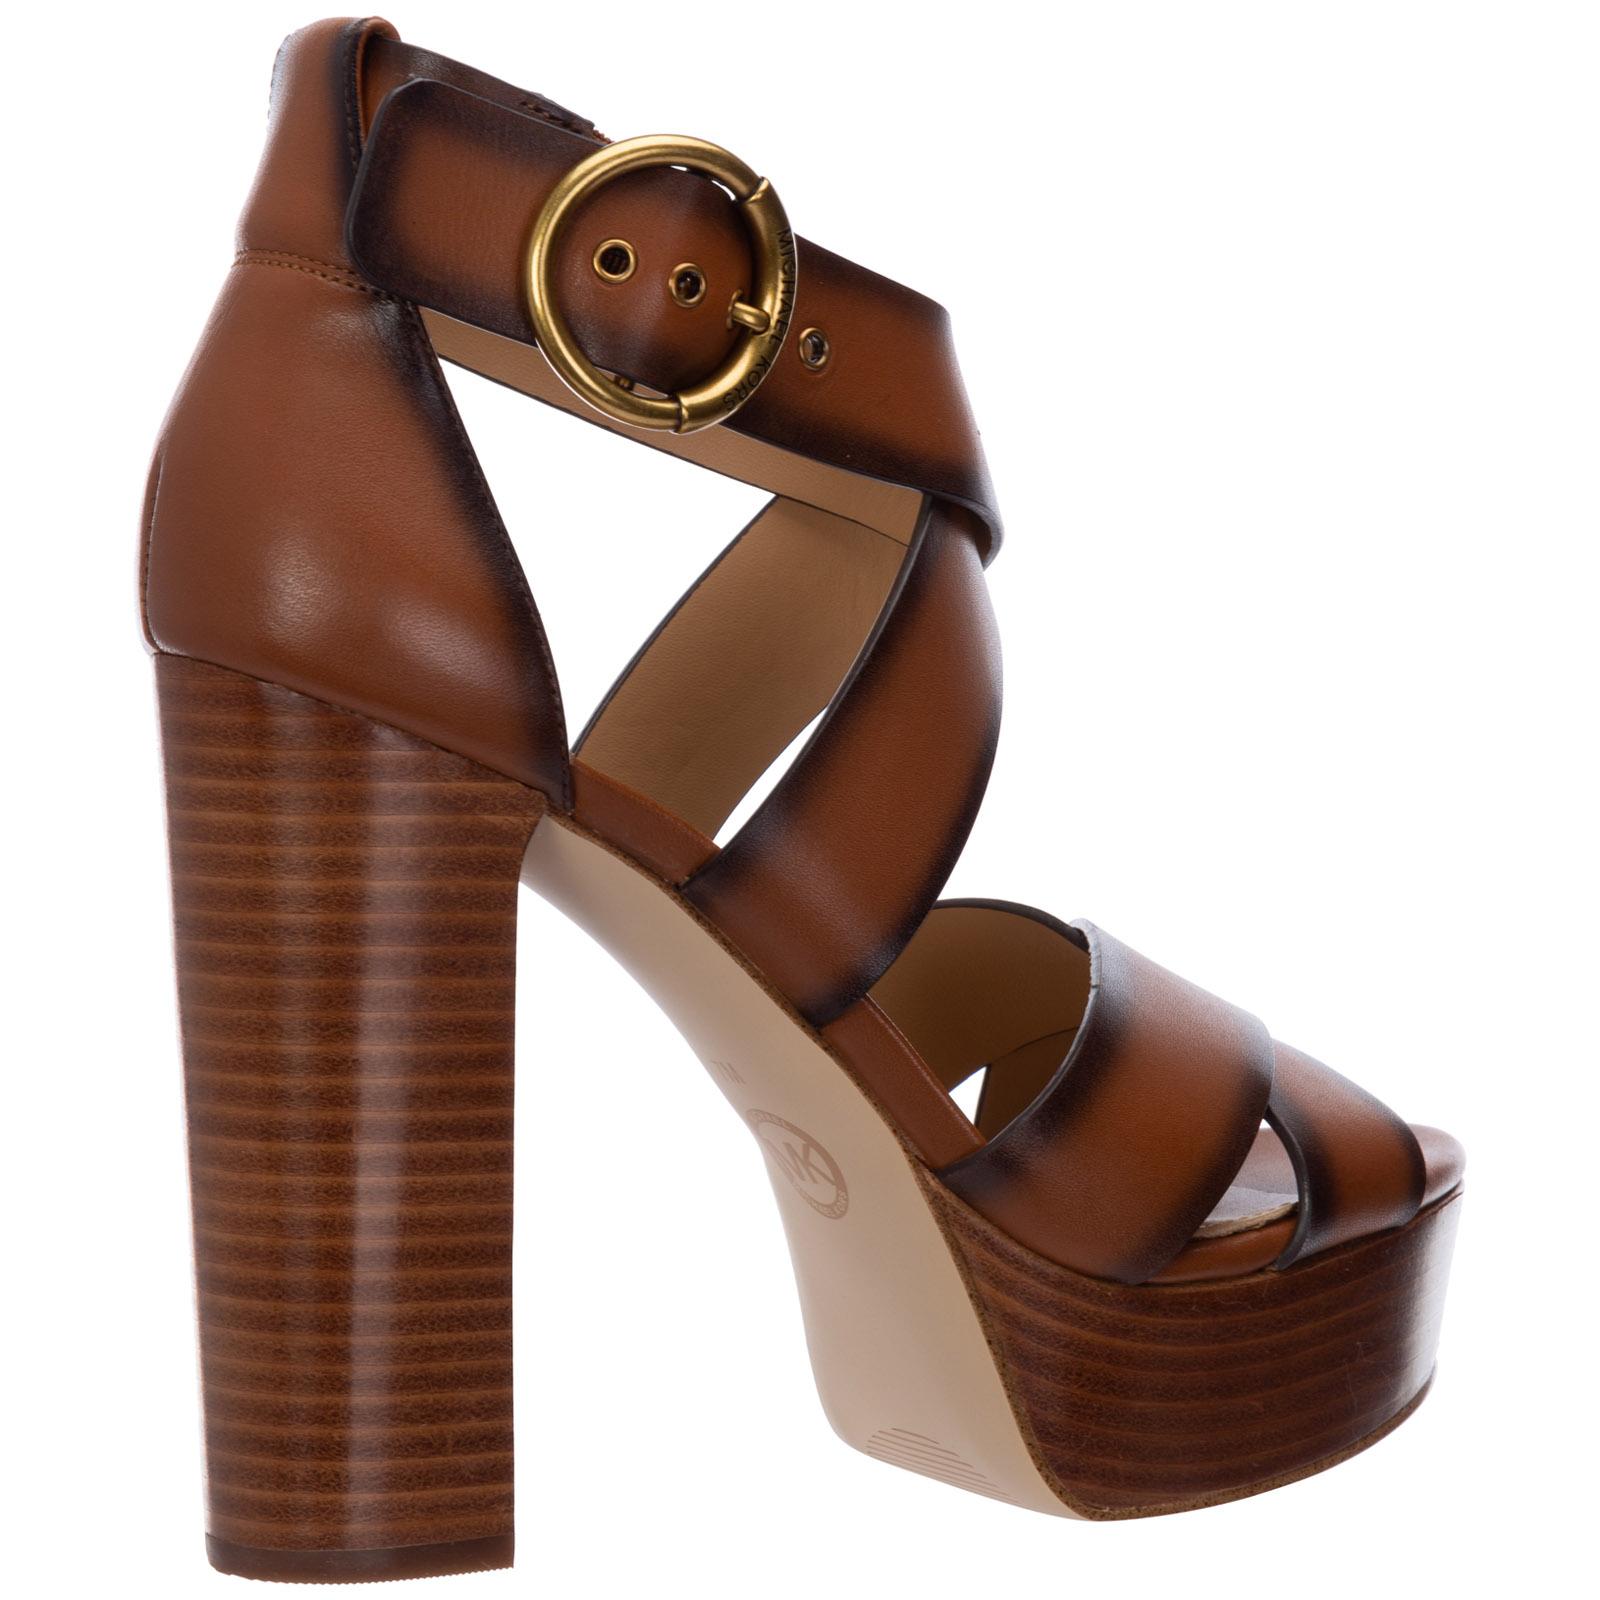 Women's leather platform sandals leia